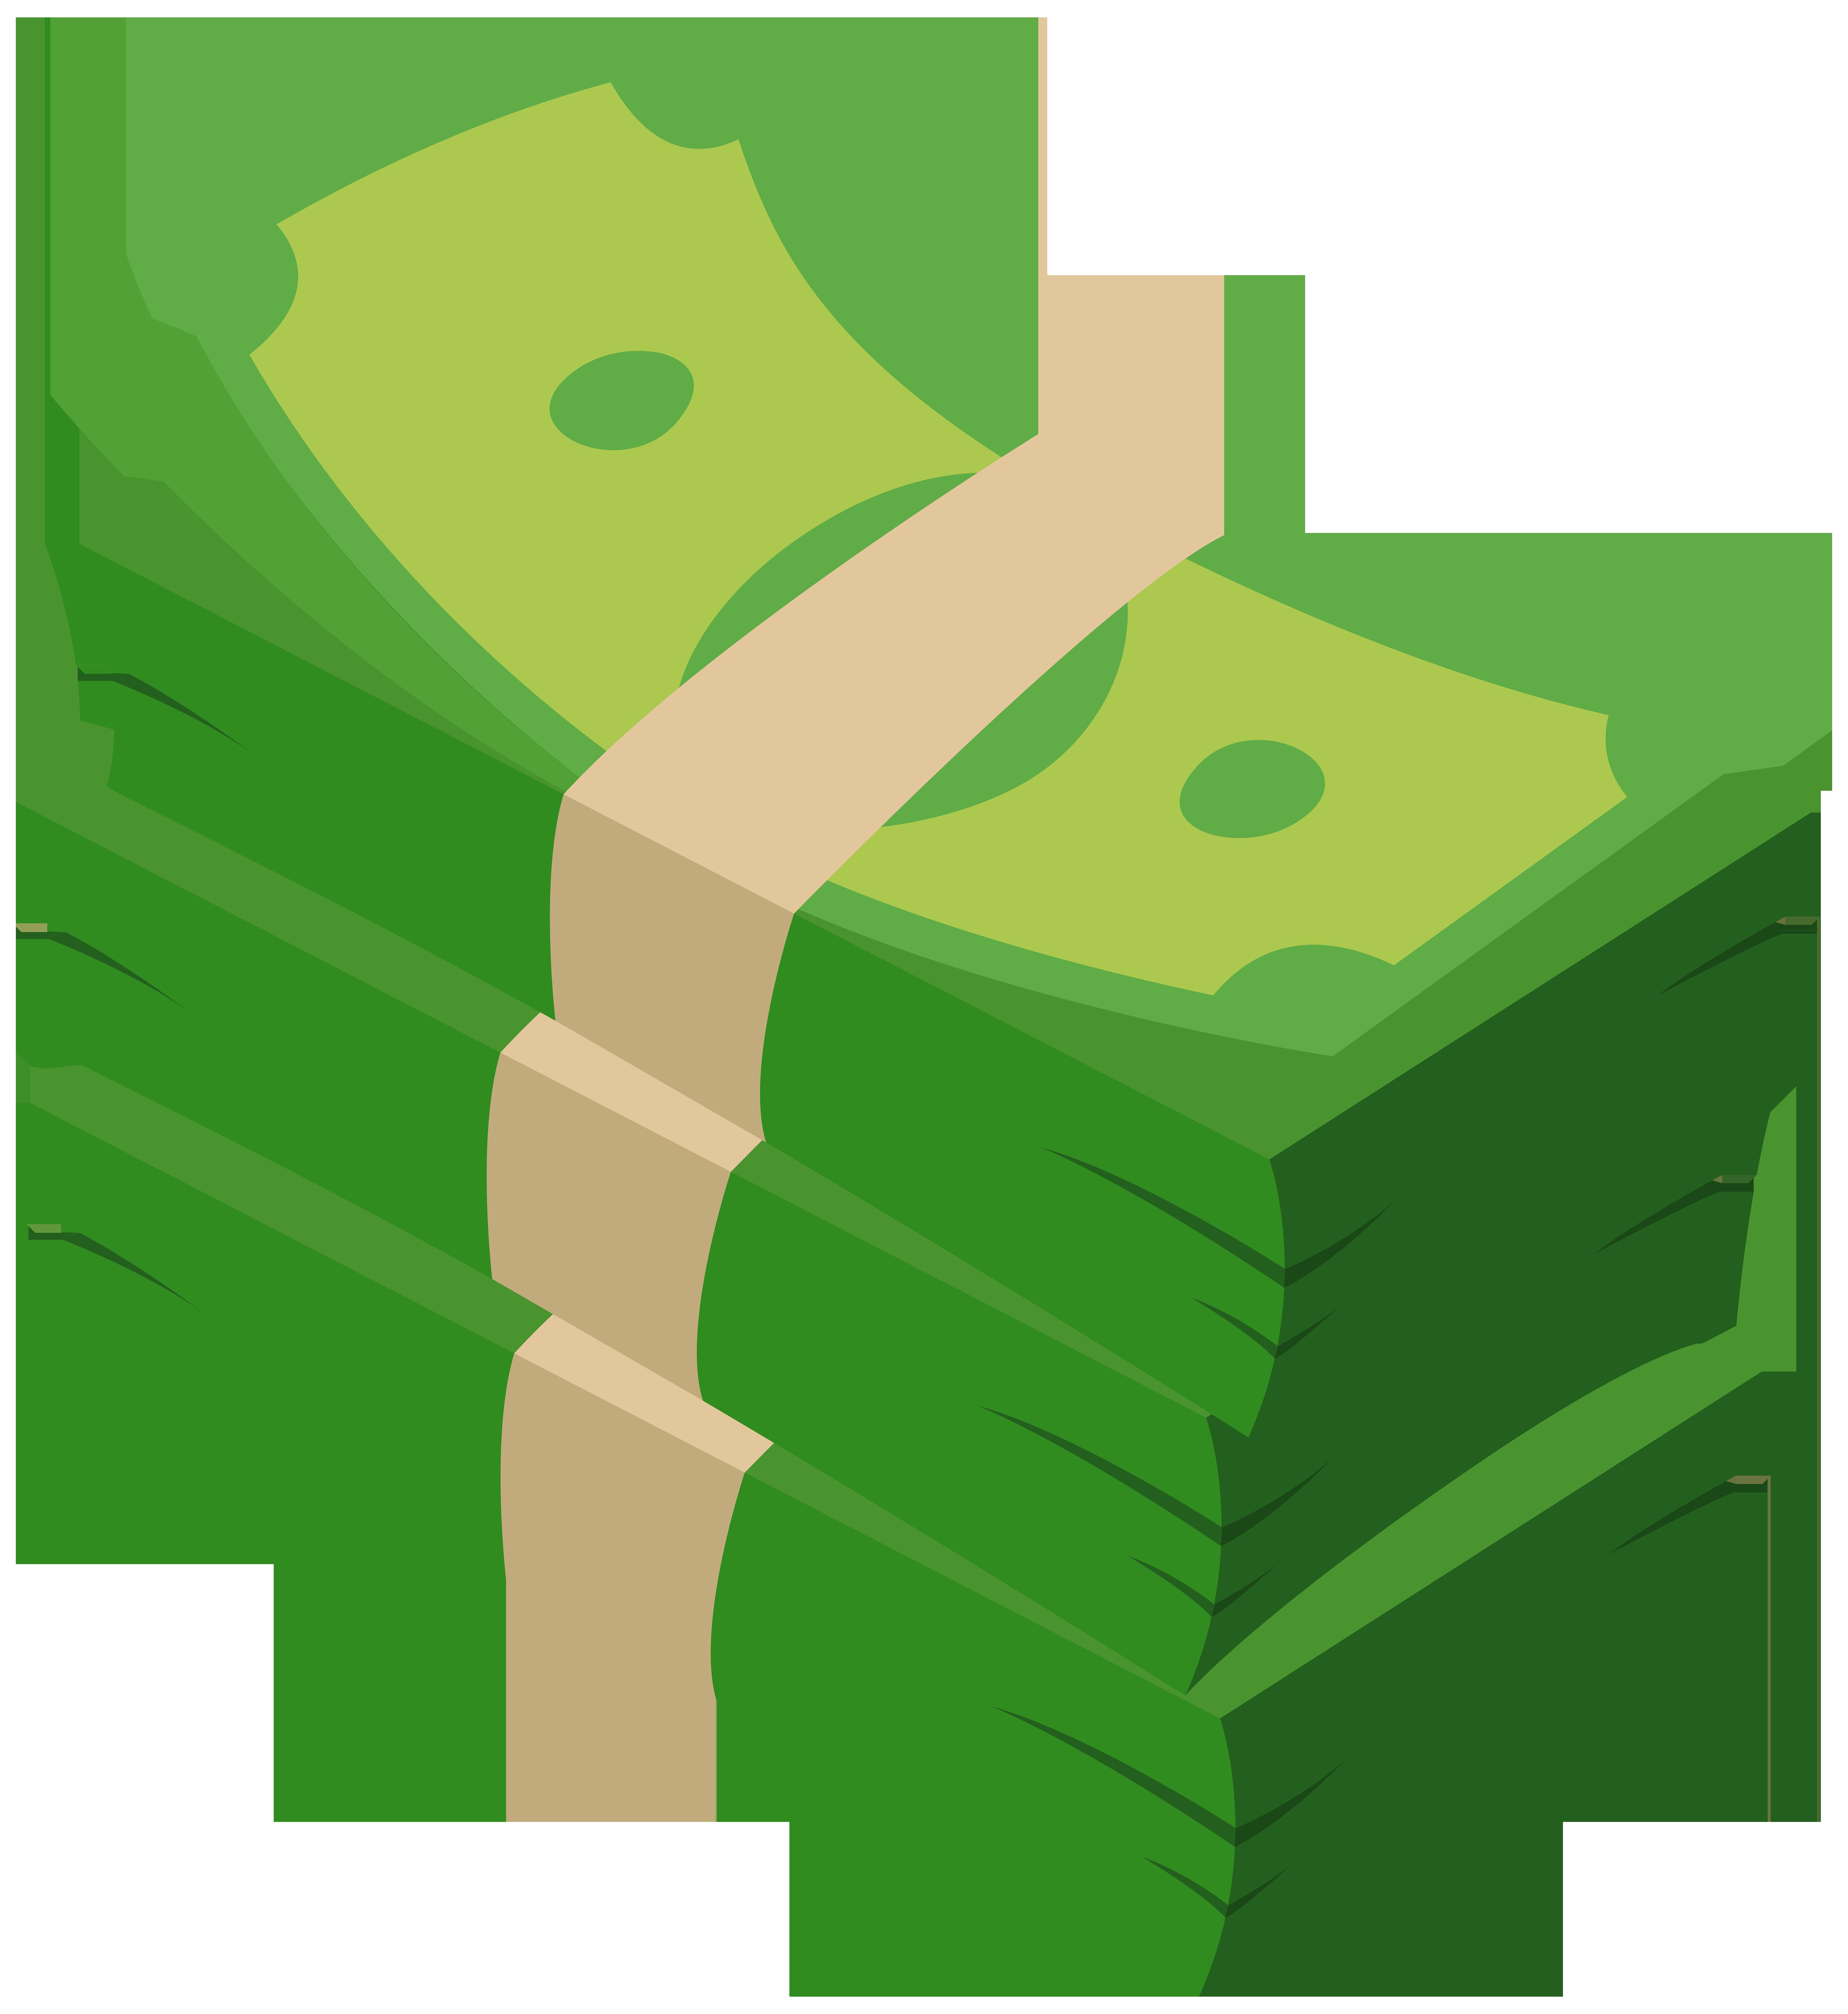 Money Illustration Transparent PNG Clip Art Image | Gallery ... clipart free